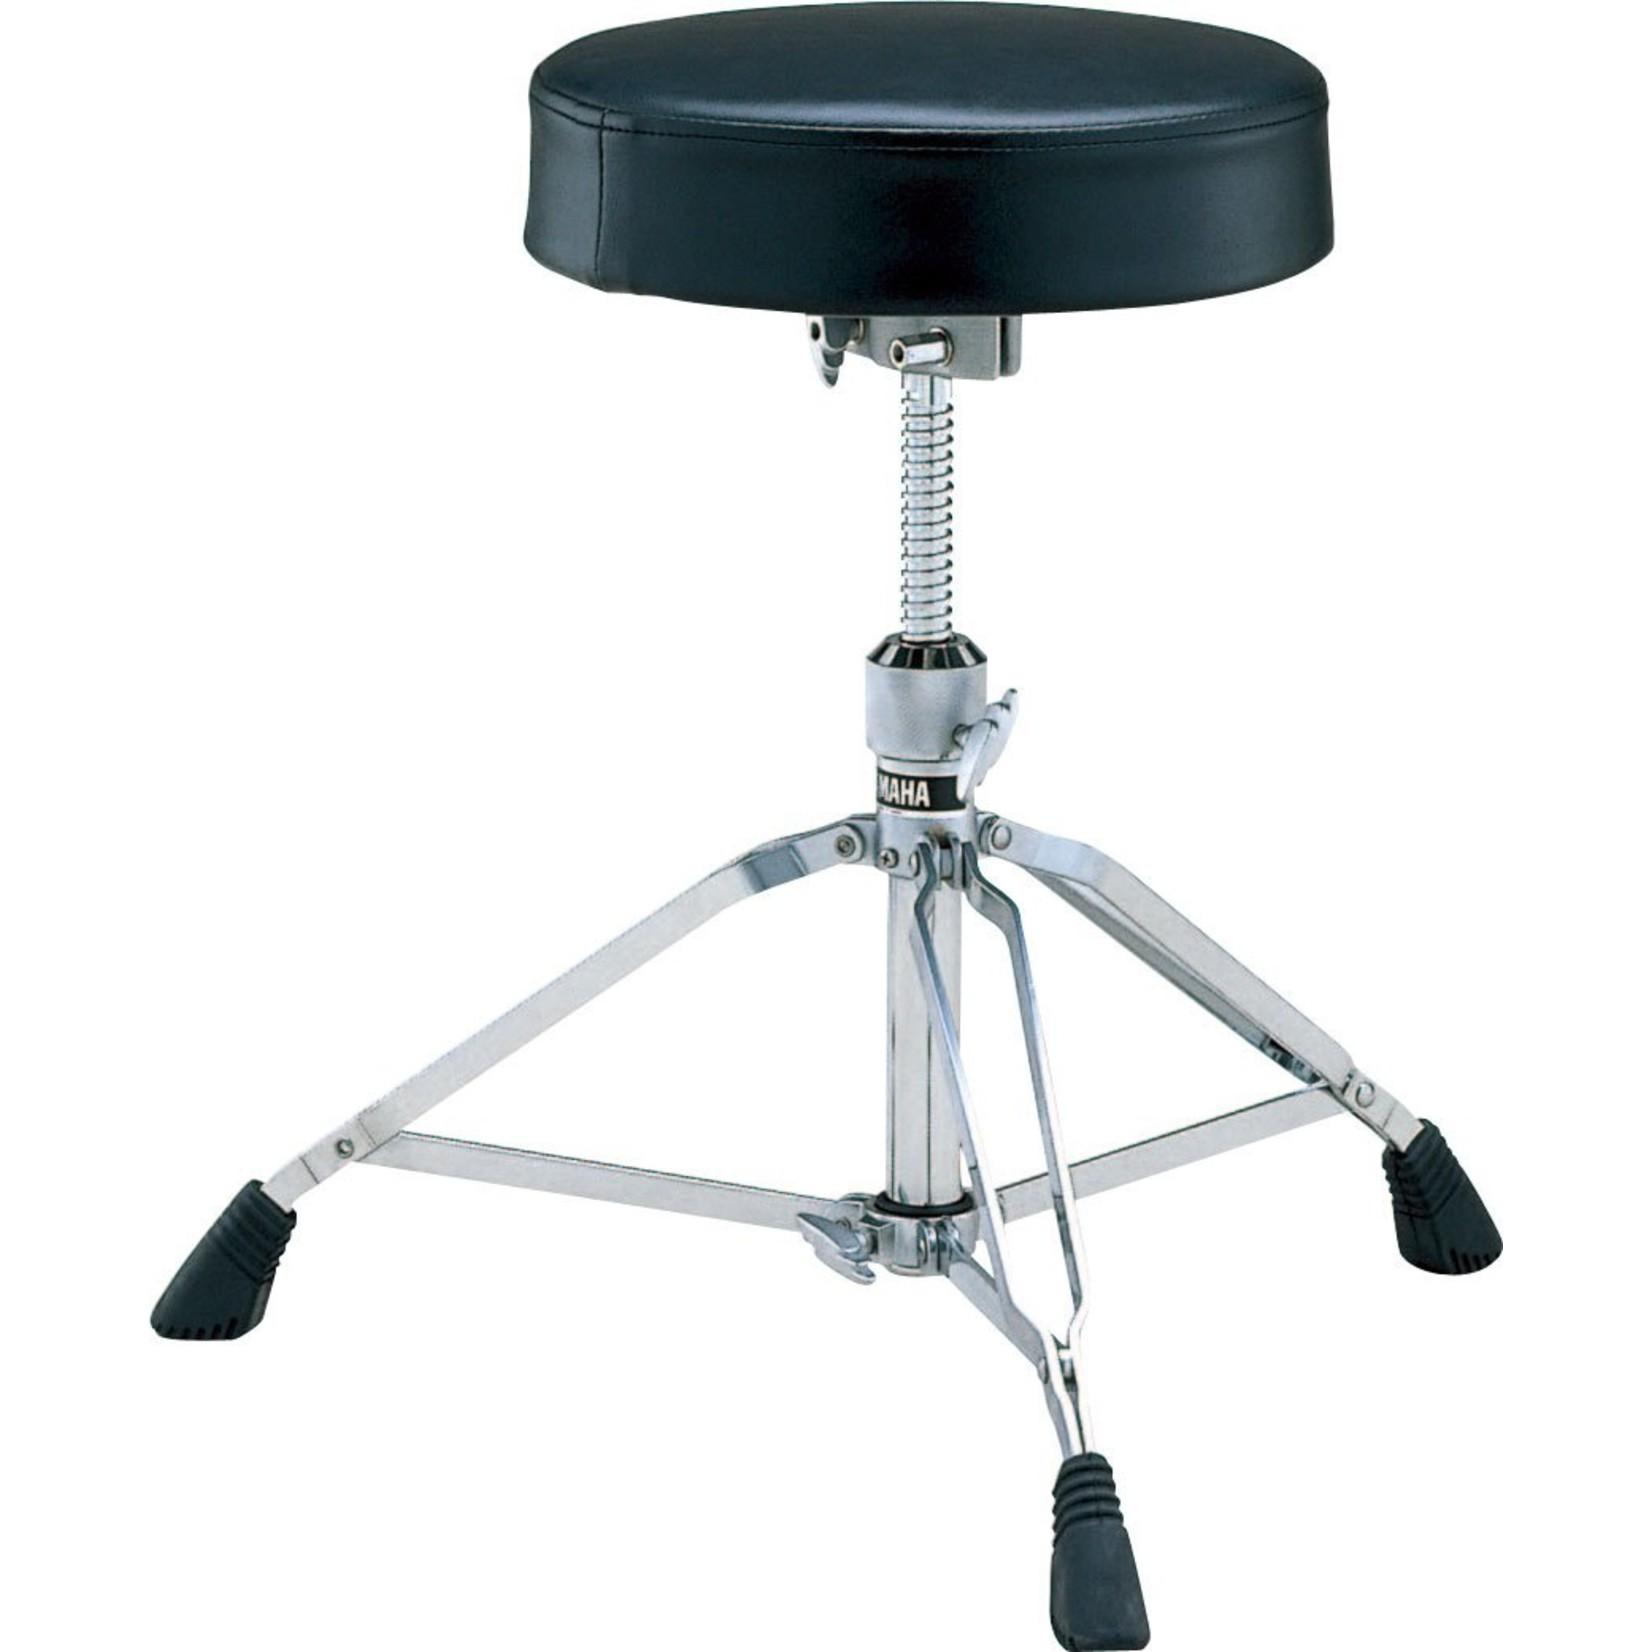 Yamaha Yamaha Drum Stool - Heavy Weight - Double Braced - Screw Height Adjustment - Round Seat